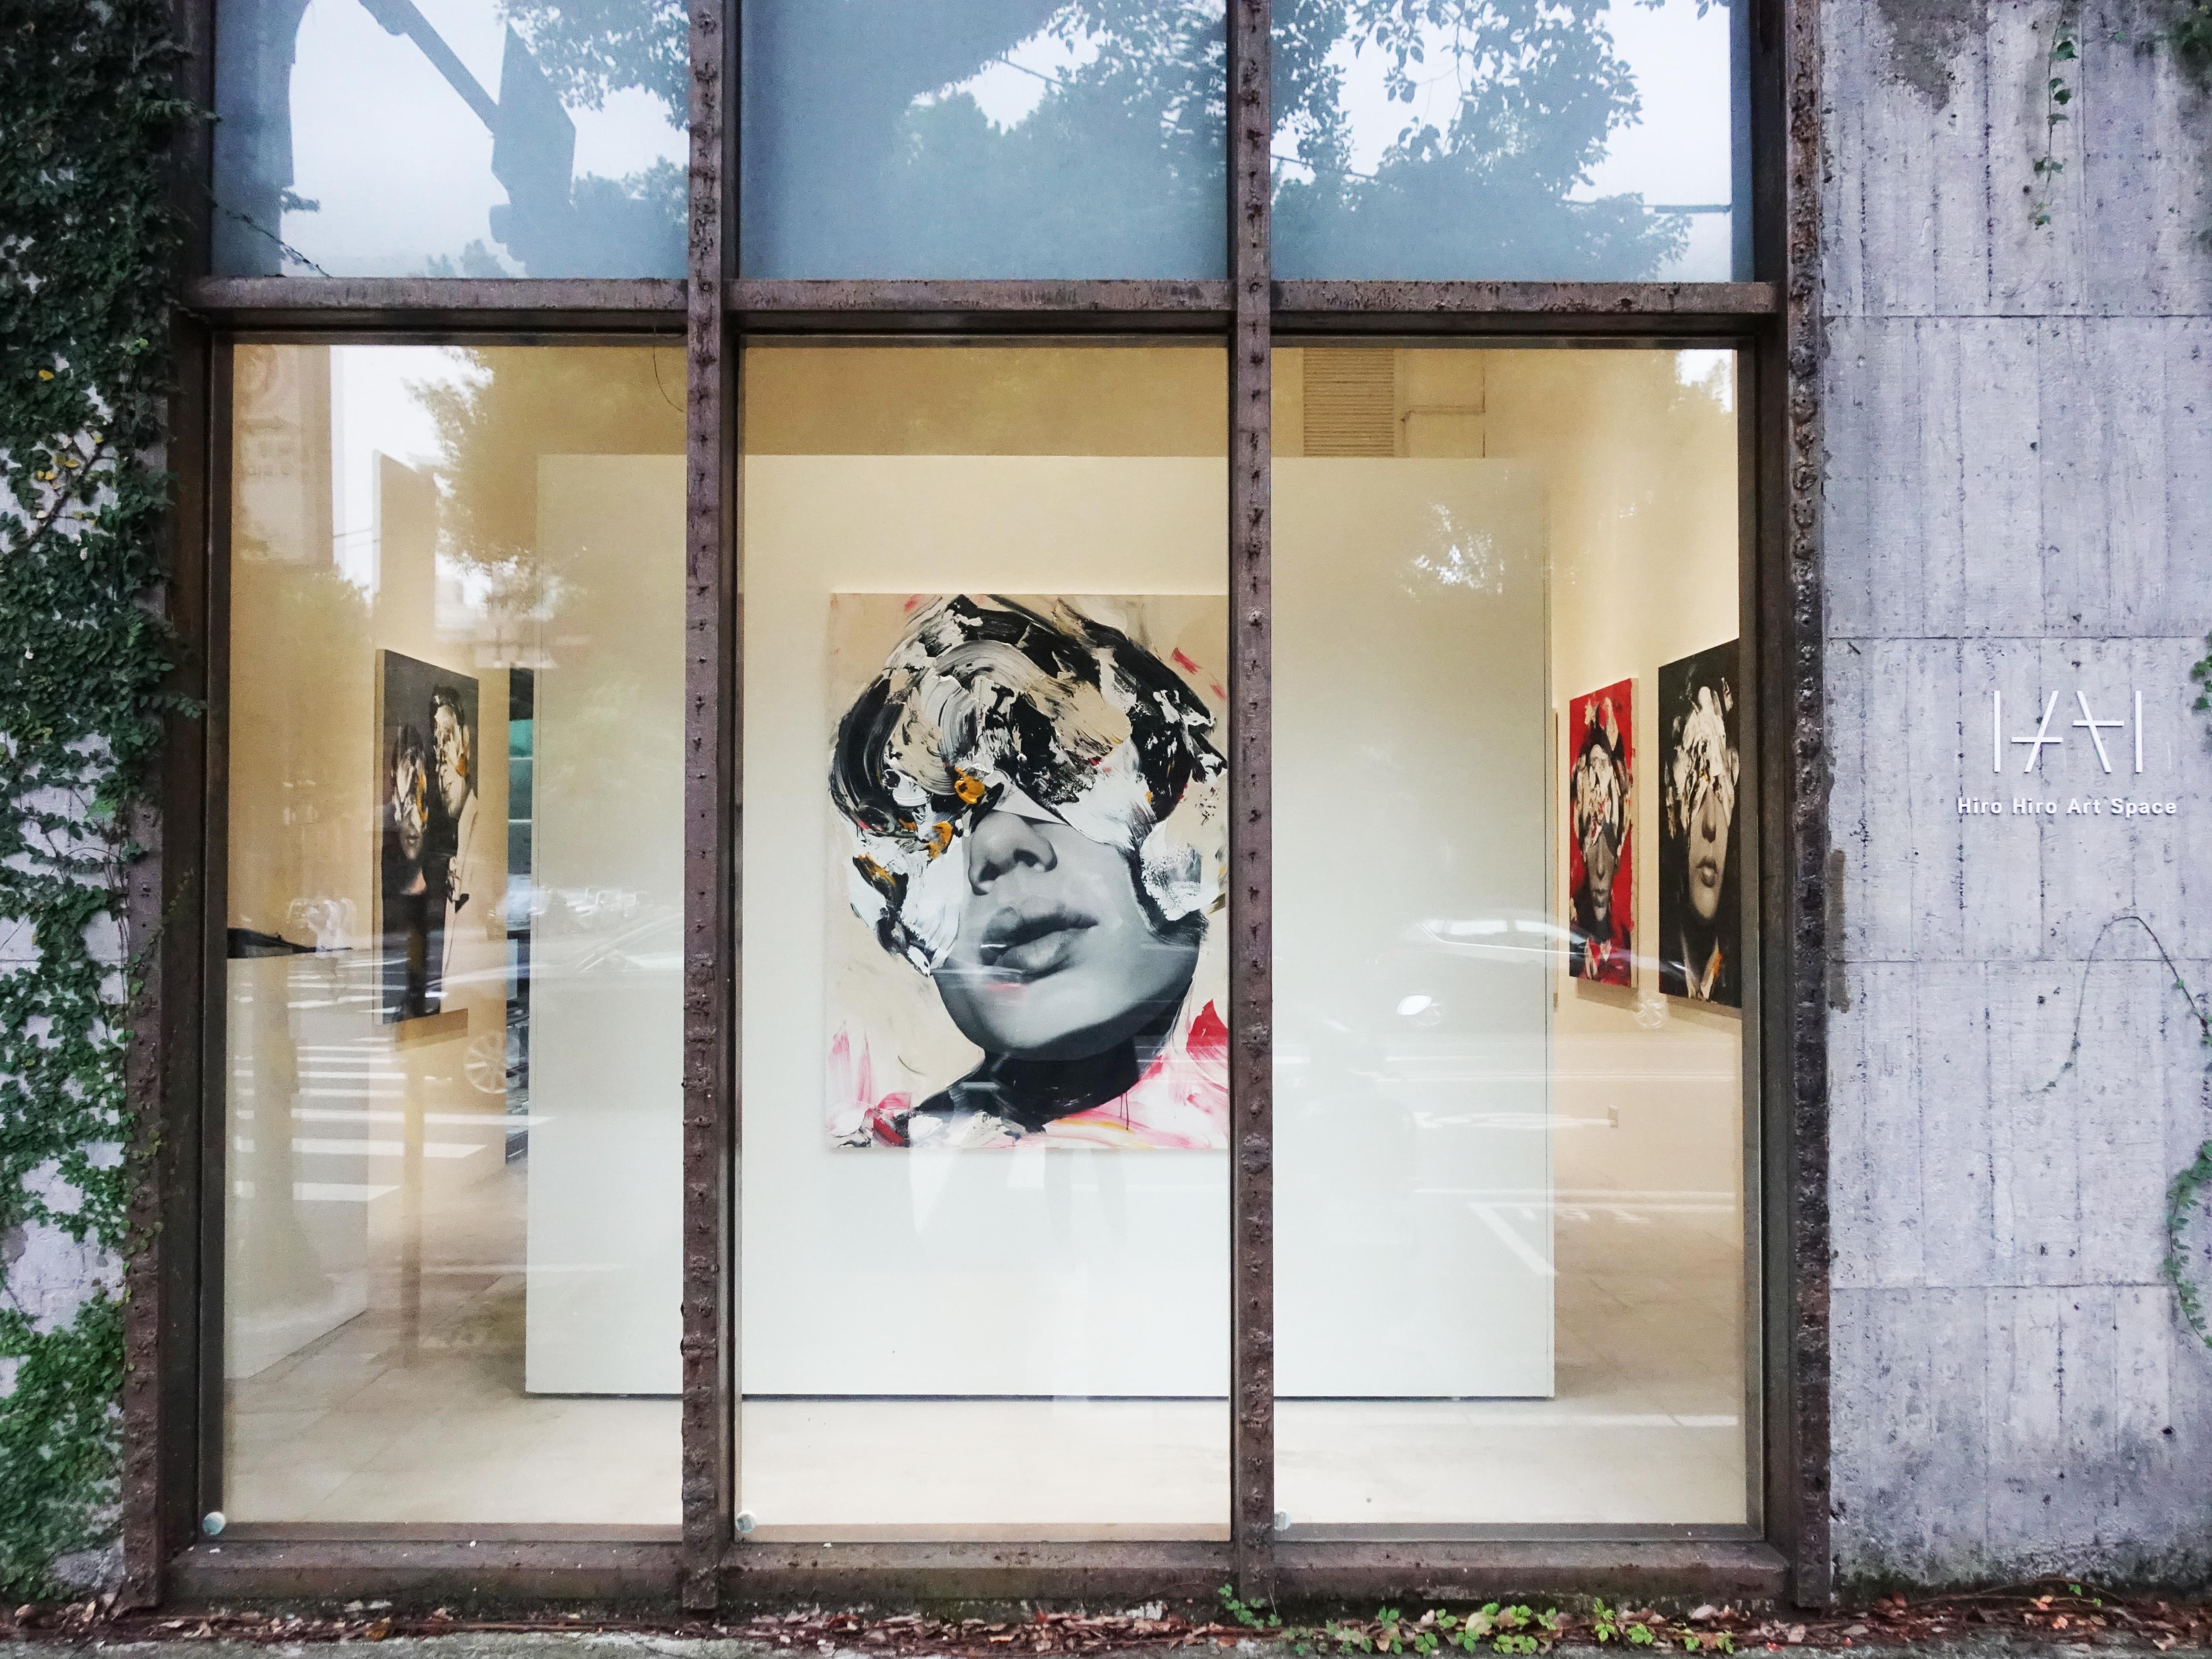 Hiro Hiro Art Space 展出藝術家佐藤誠高創作個展《表面、真實之離散》。